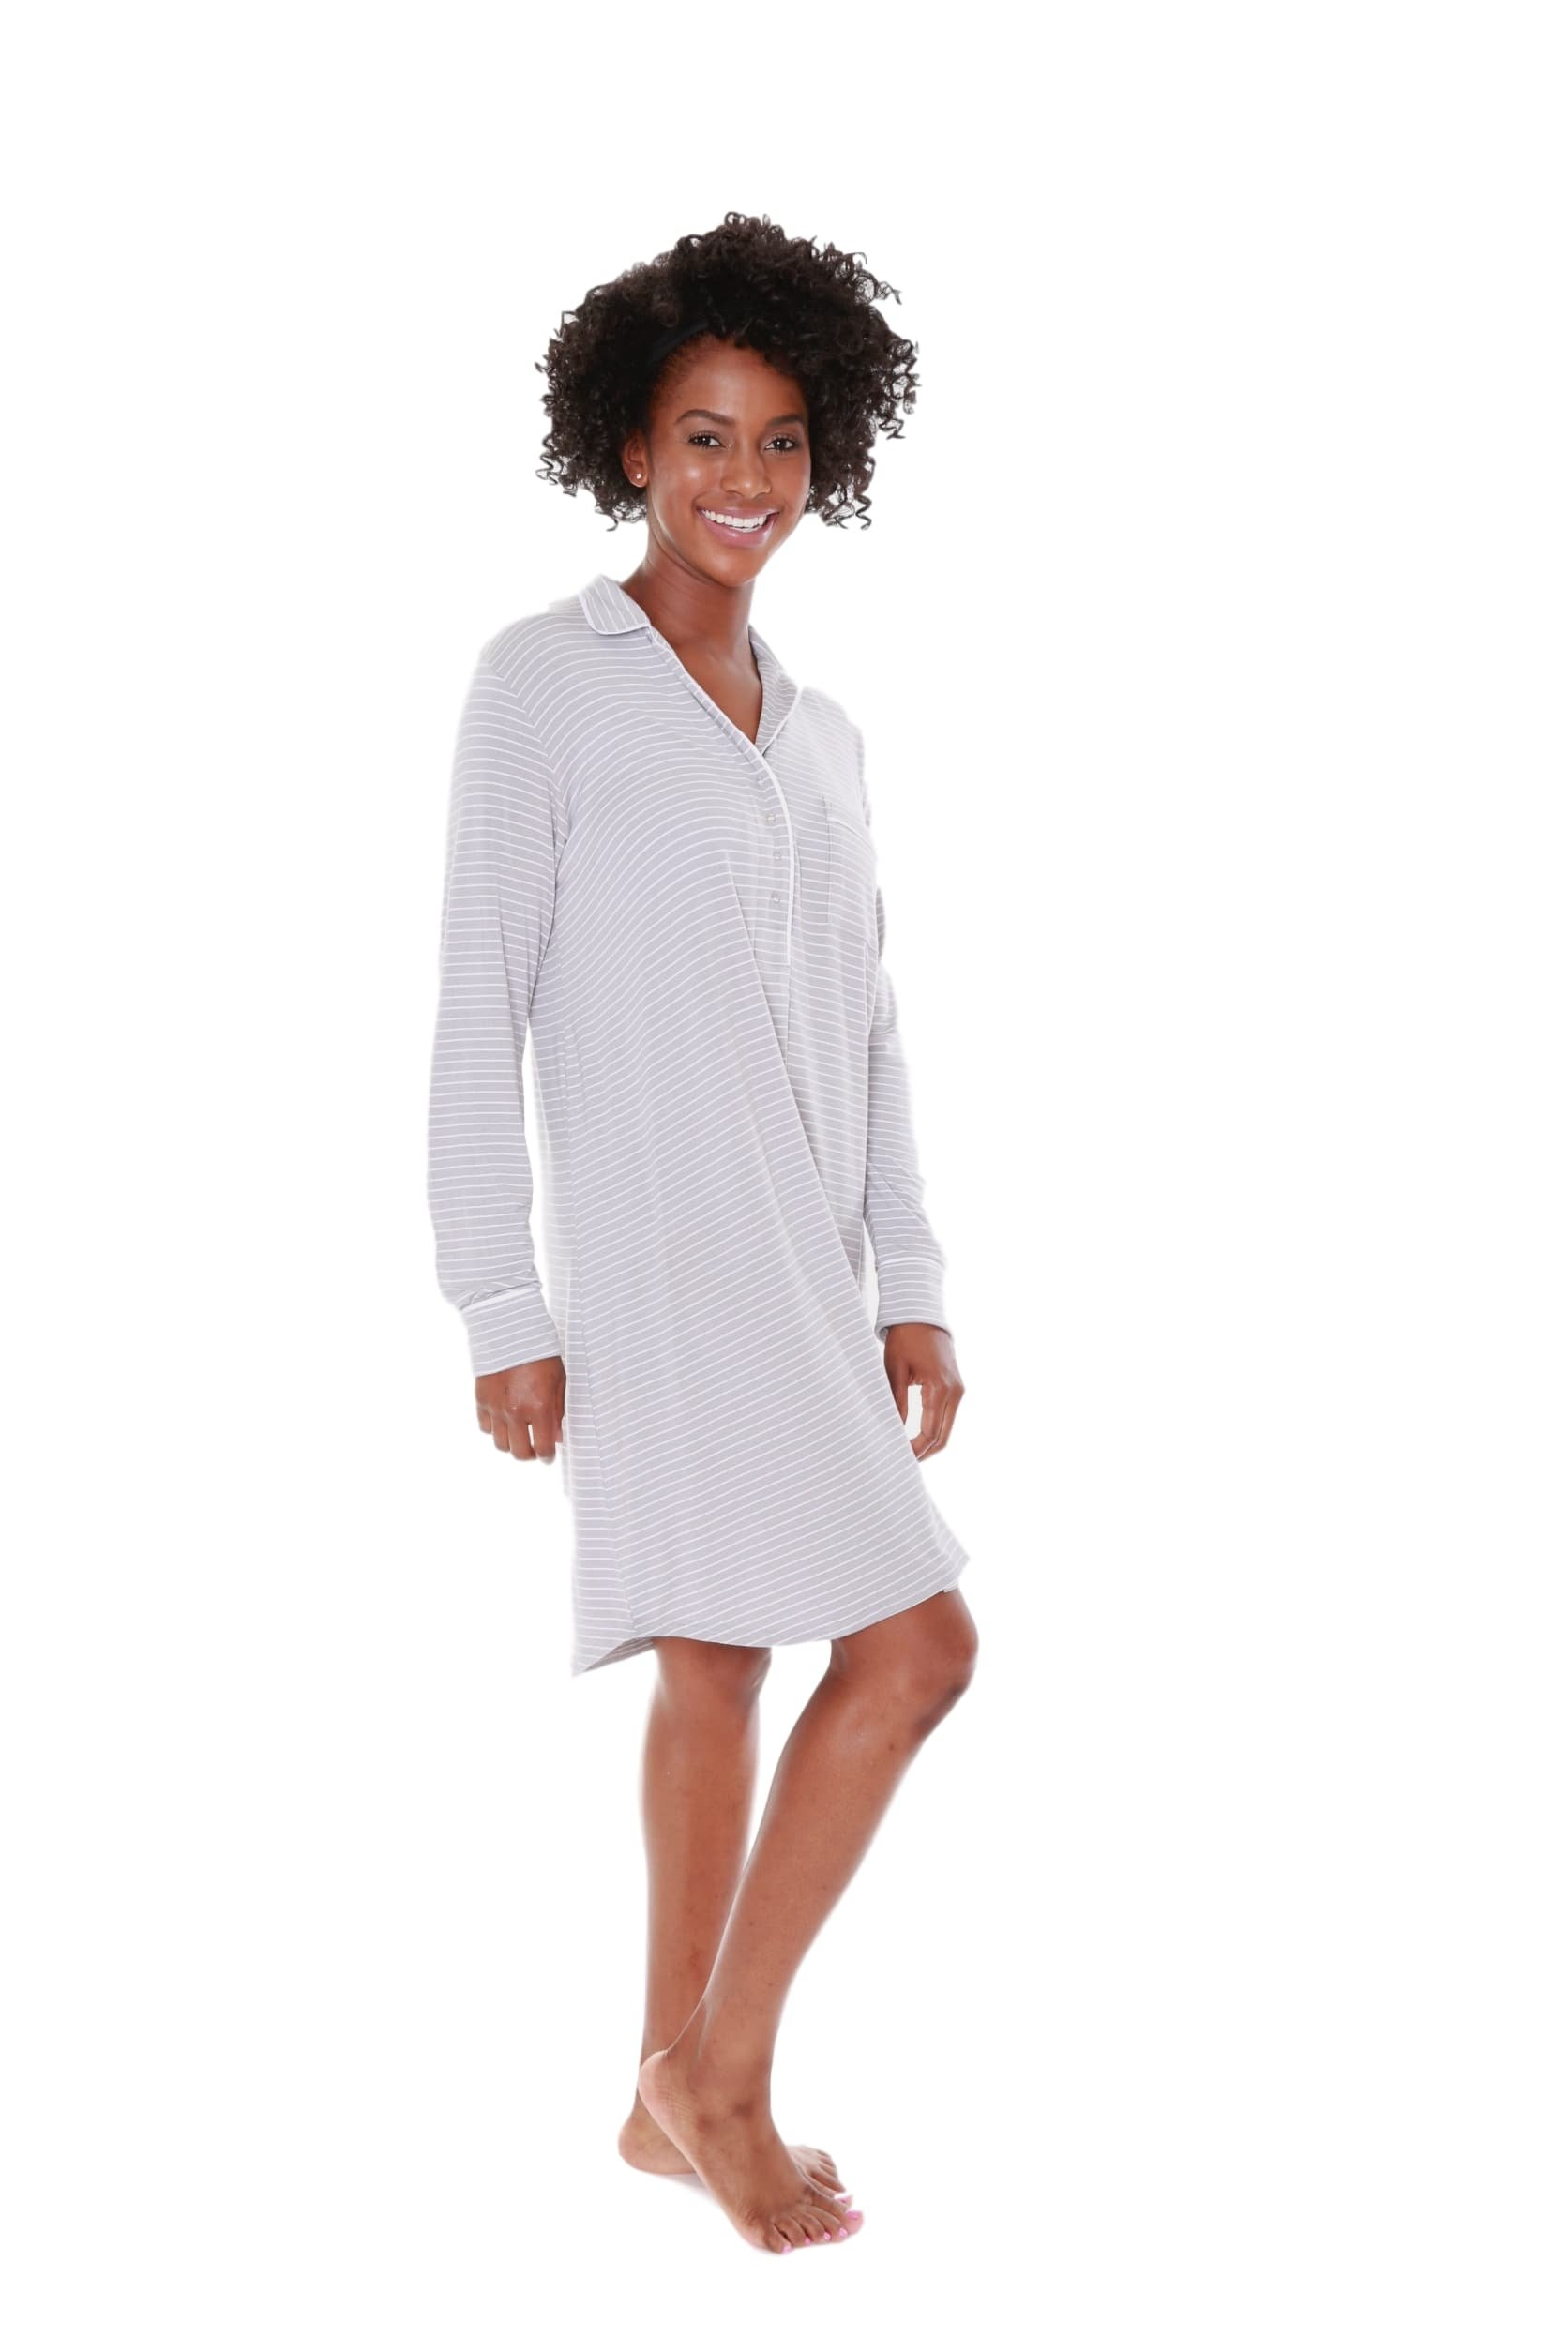 Baby Be Mine Maternity Super Soft Classic Stripe Maternity Nursing Nightshirt Nightgown Pregnancy Nightwear (L 12-14, Grey Stripe)